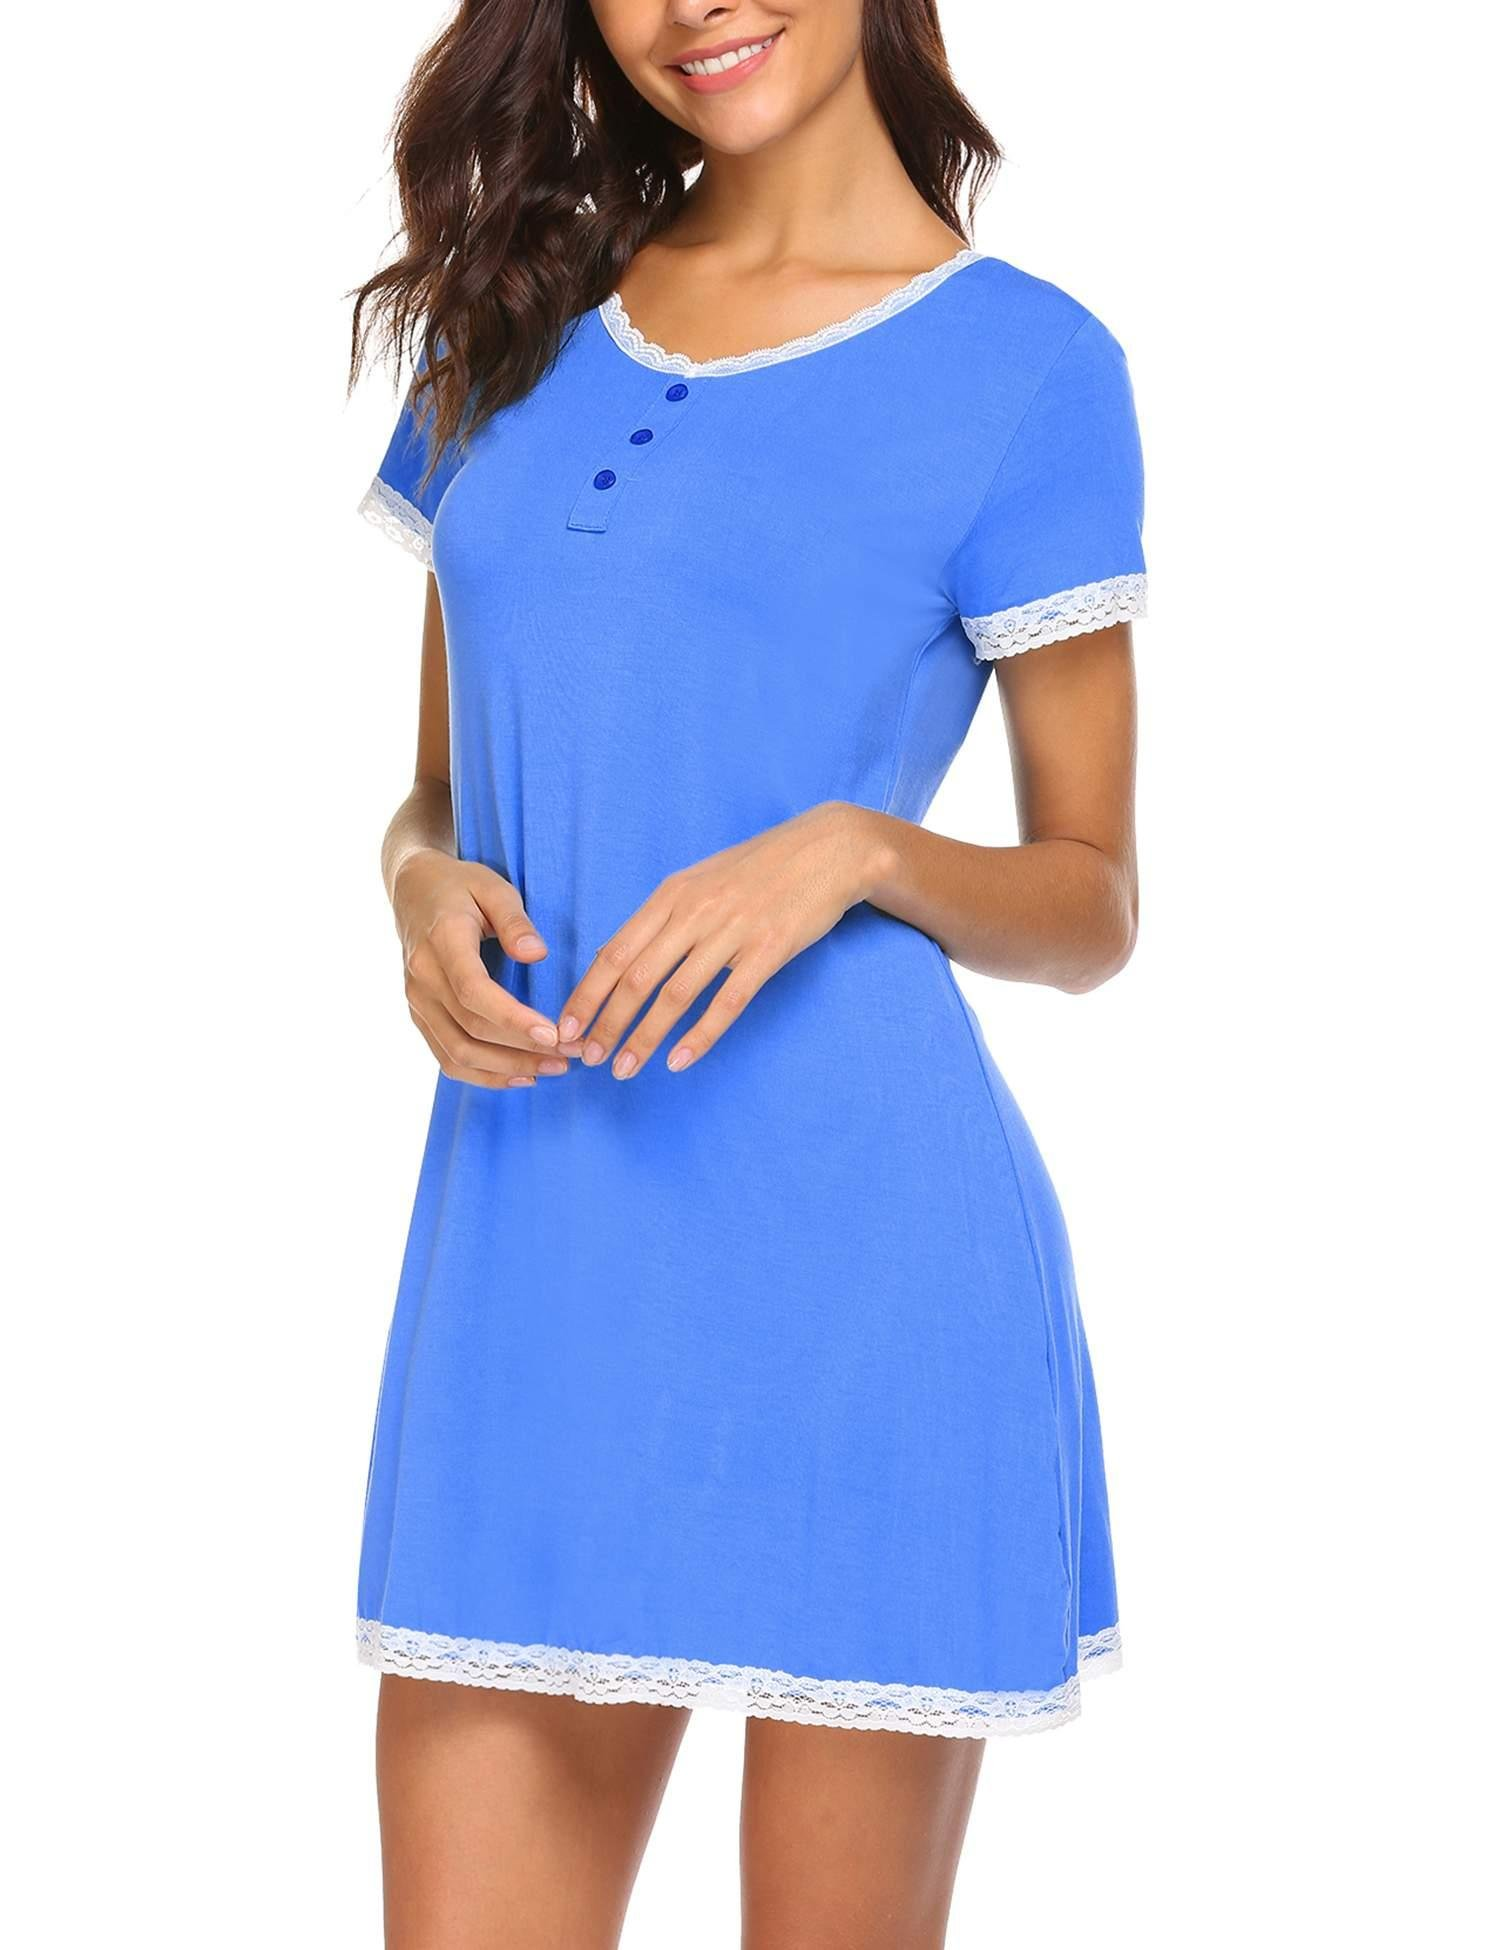 Ekouaer Nightgown Women¡¯s Henley Sleeveless Sleep Shirt Button Down Nightshirt Sleepwear (Blue XXL)